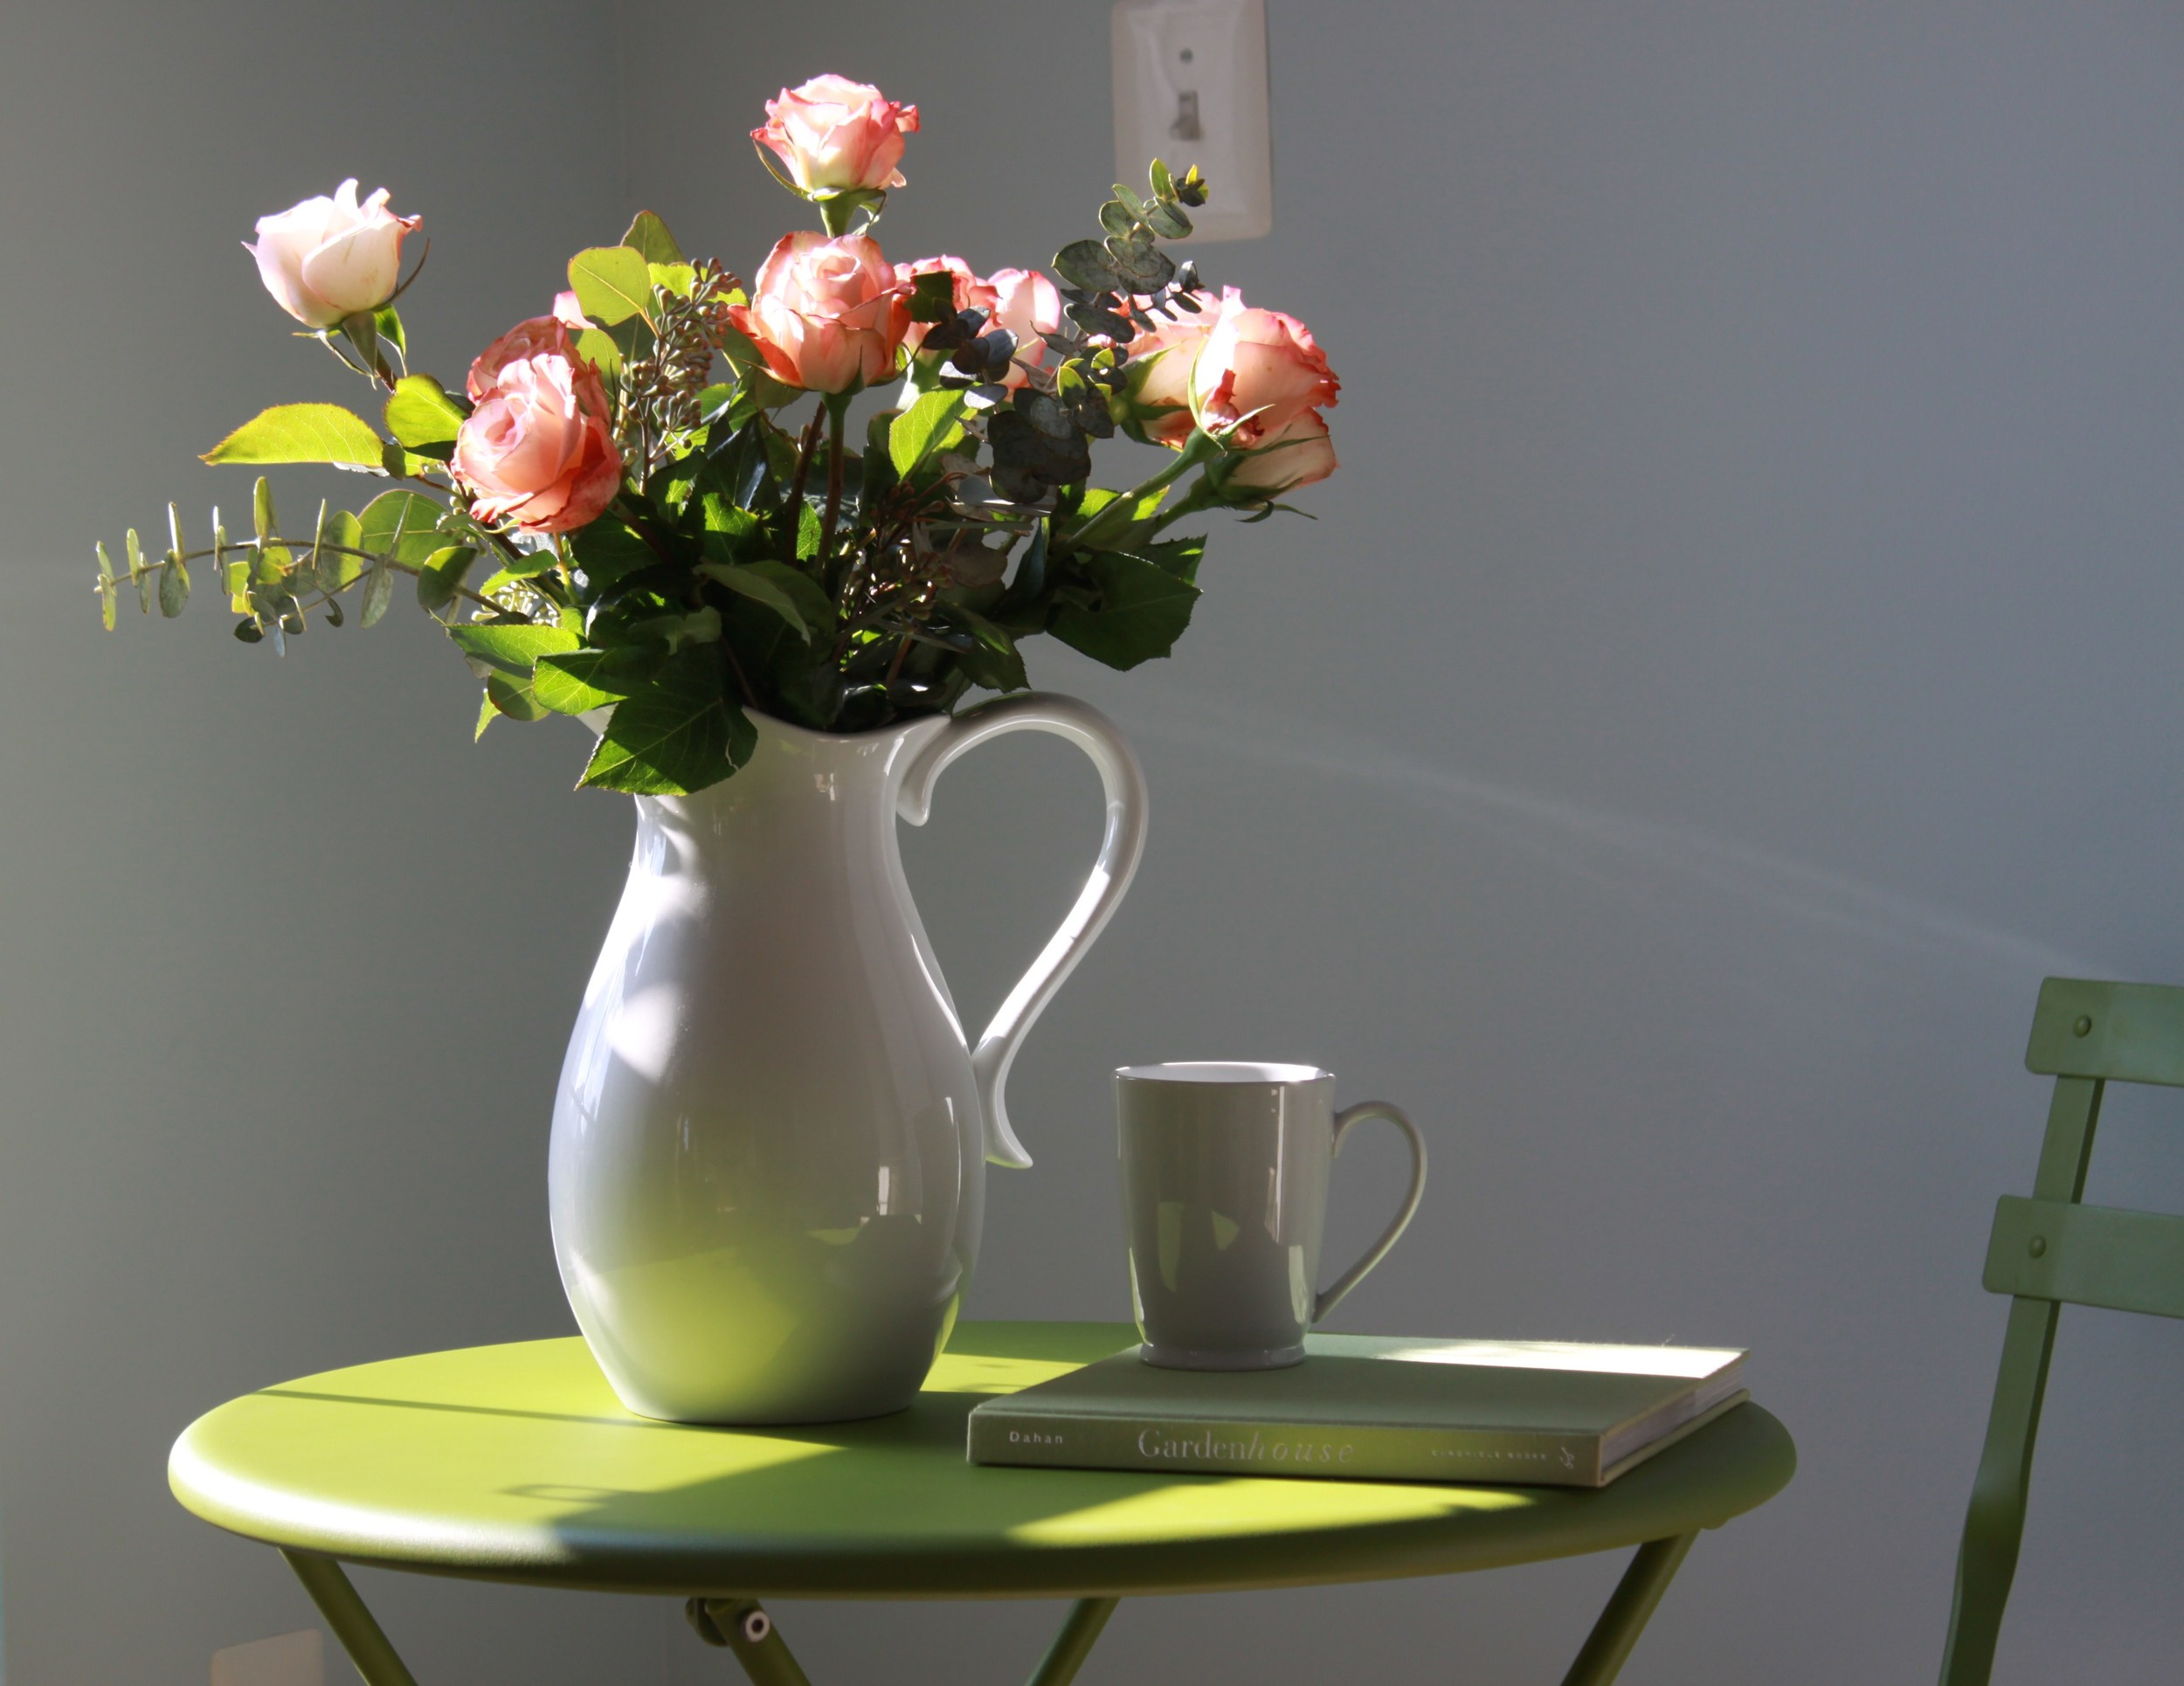 rose-quartz-vase-spring-decor.jpeg